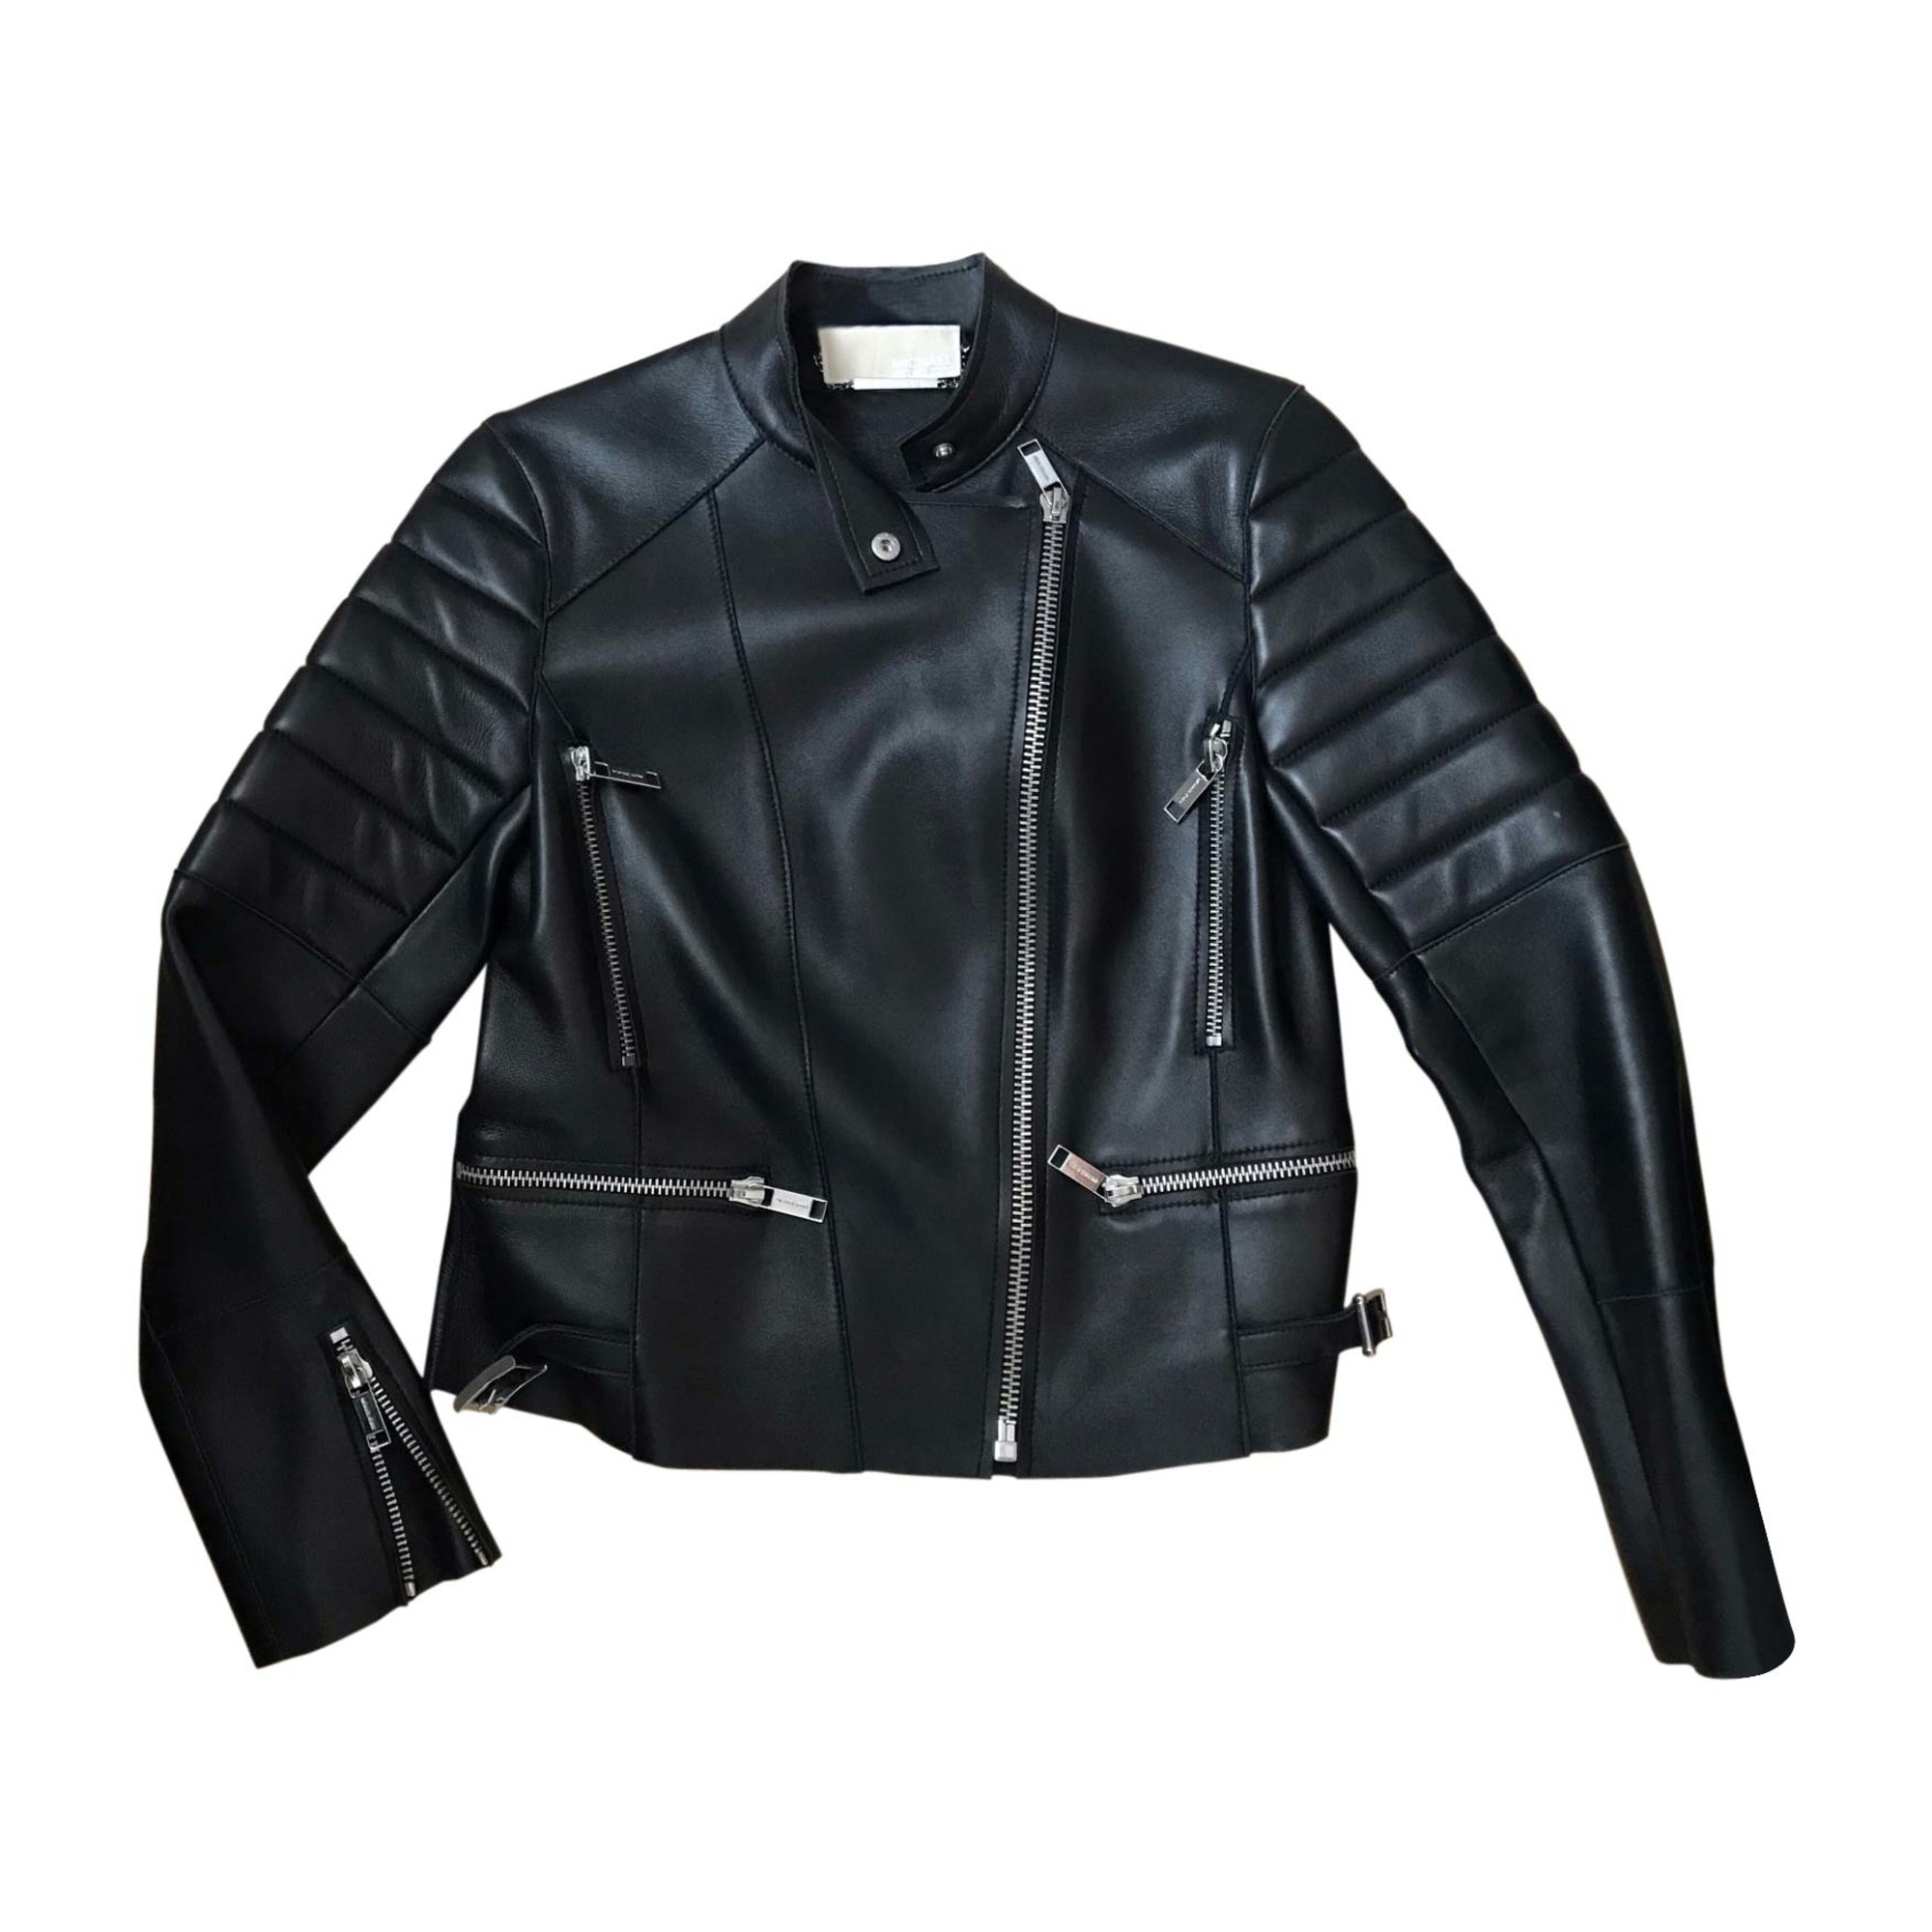 Leather Zipped Jacket MICHAEL KORS Black